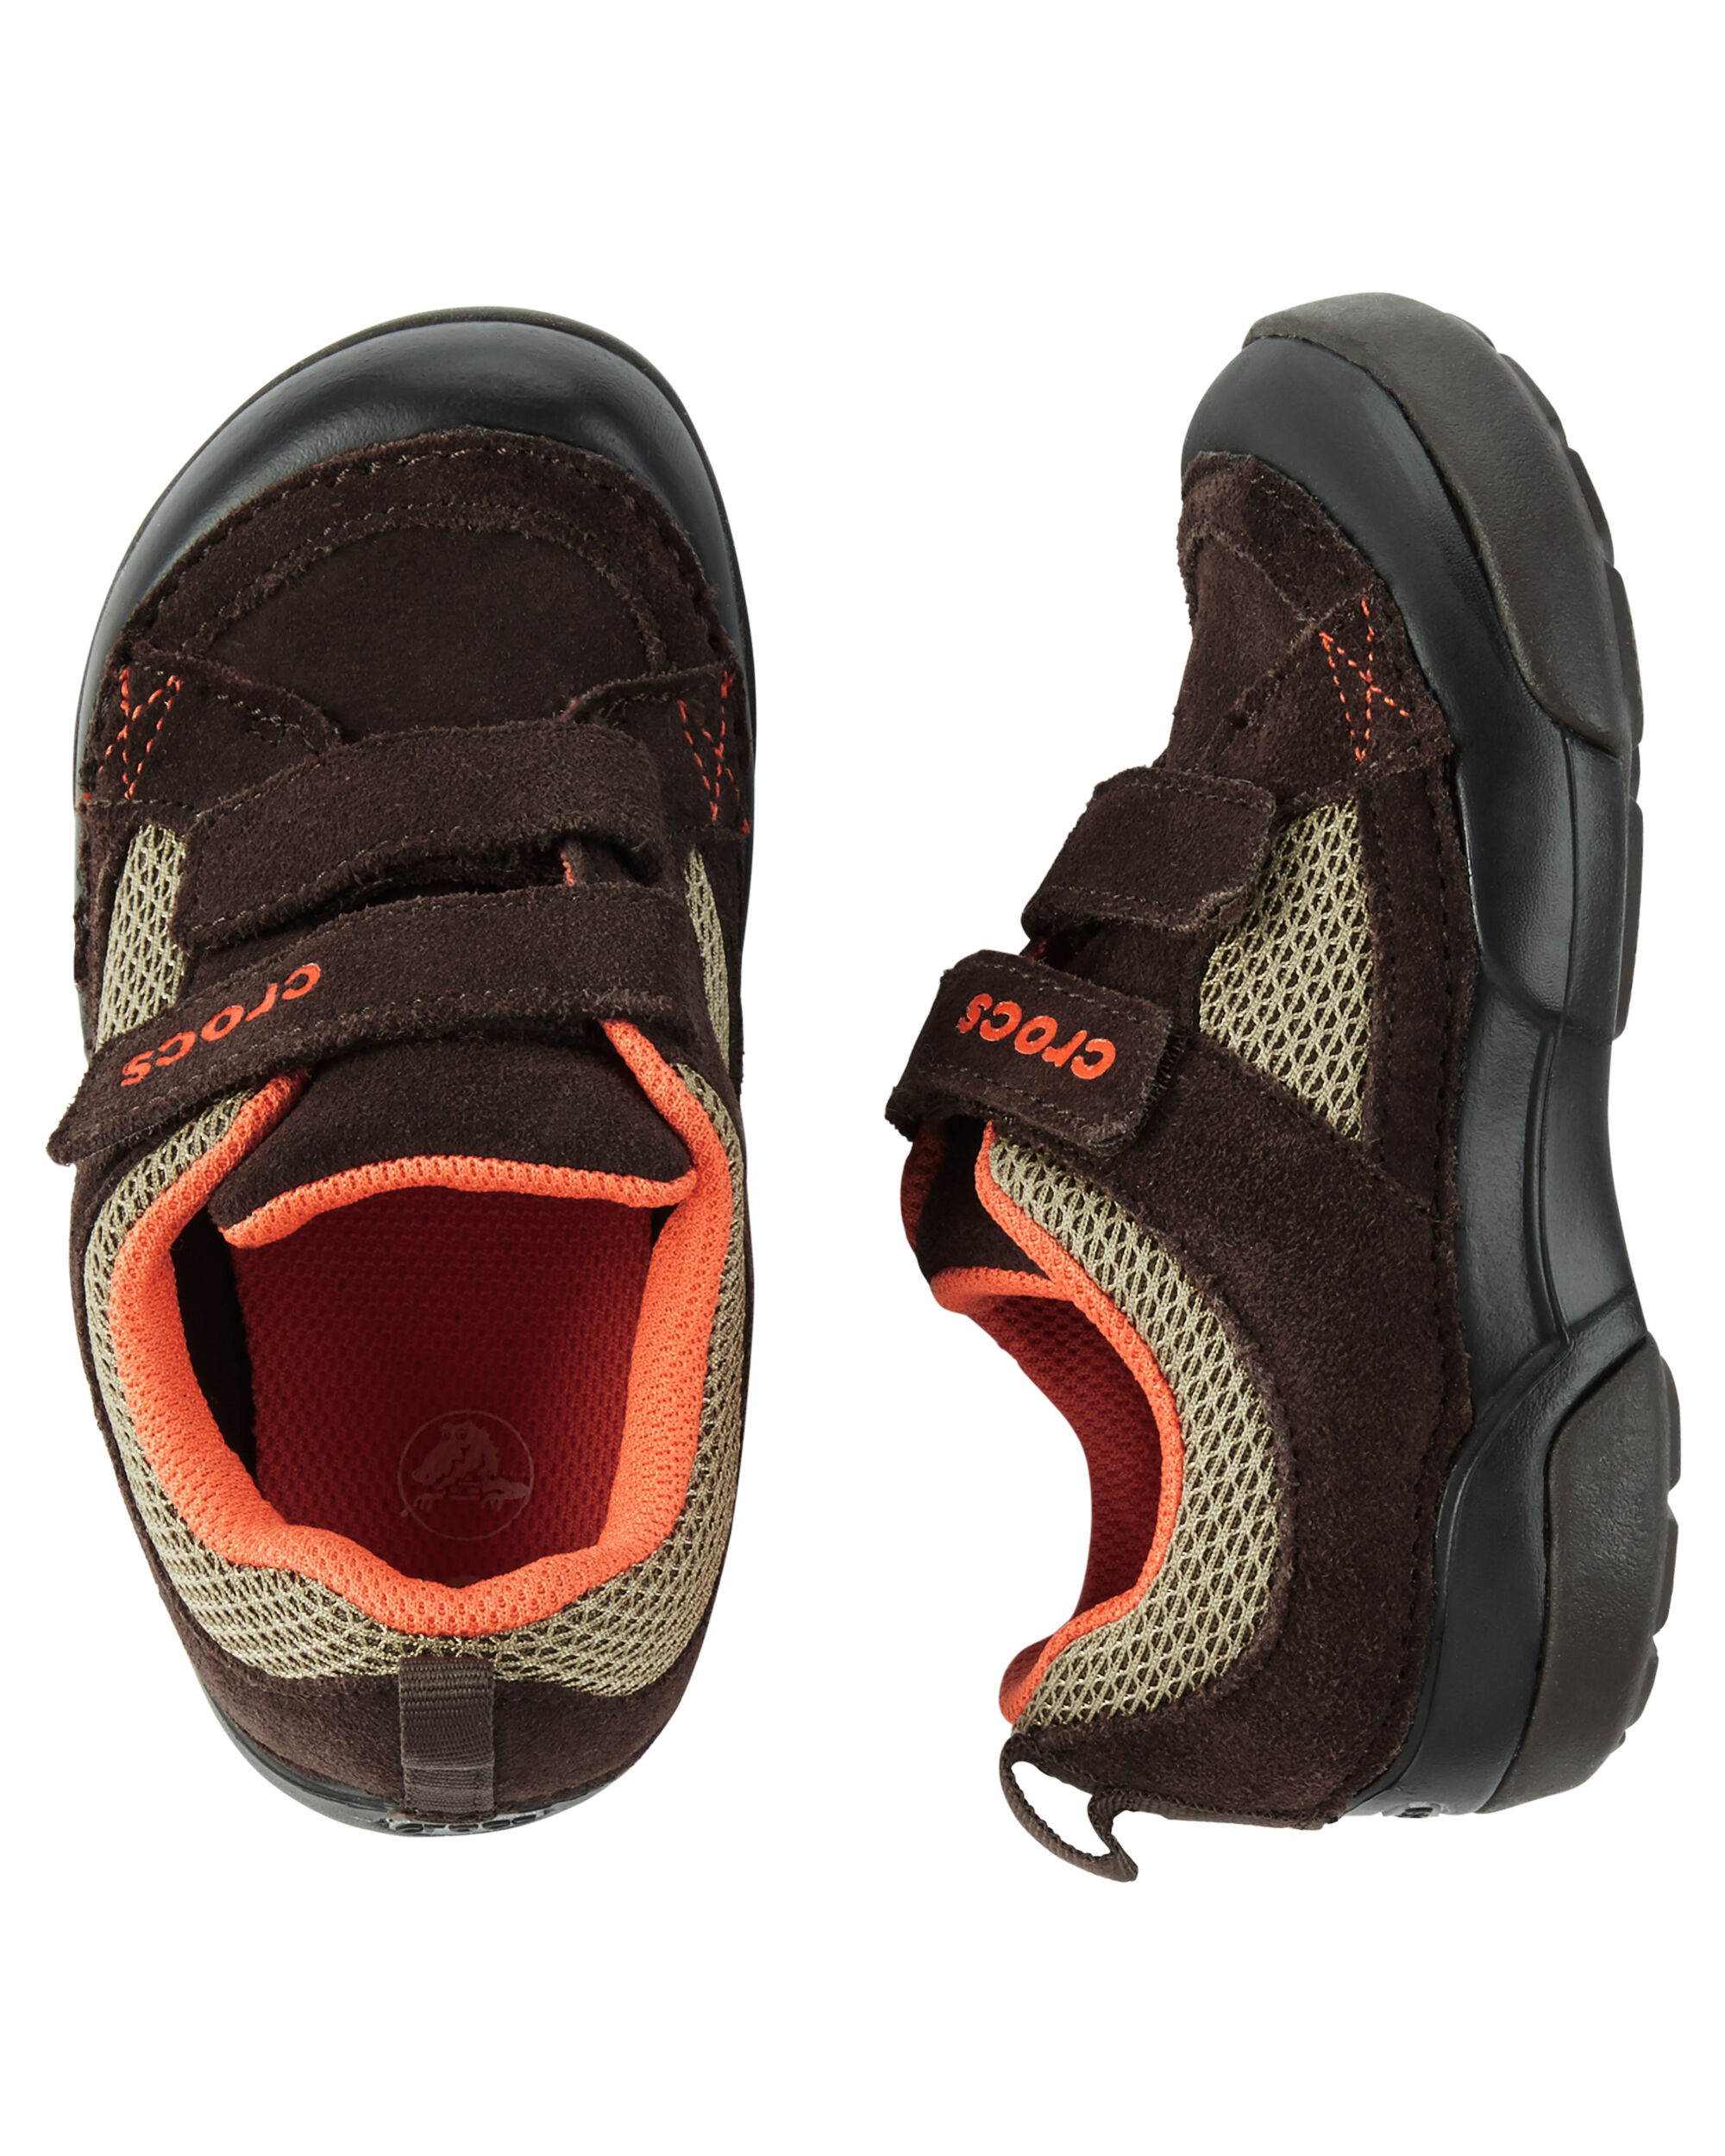 37eca9685f0959 Crocs Dawson Easy-On Shoe ...